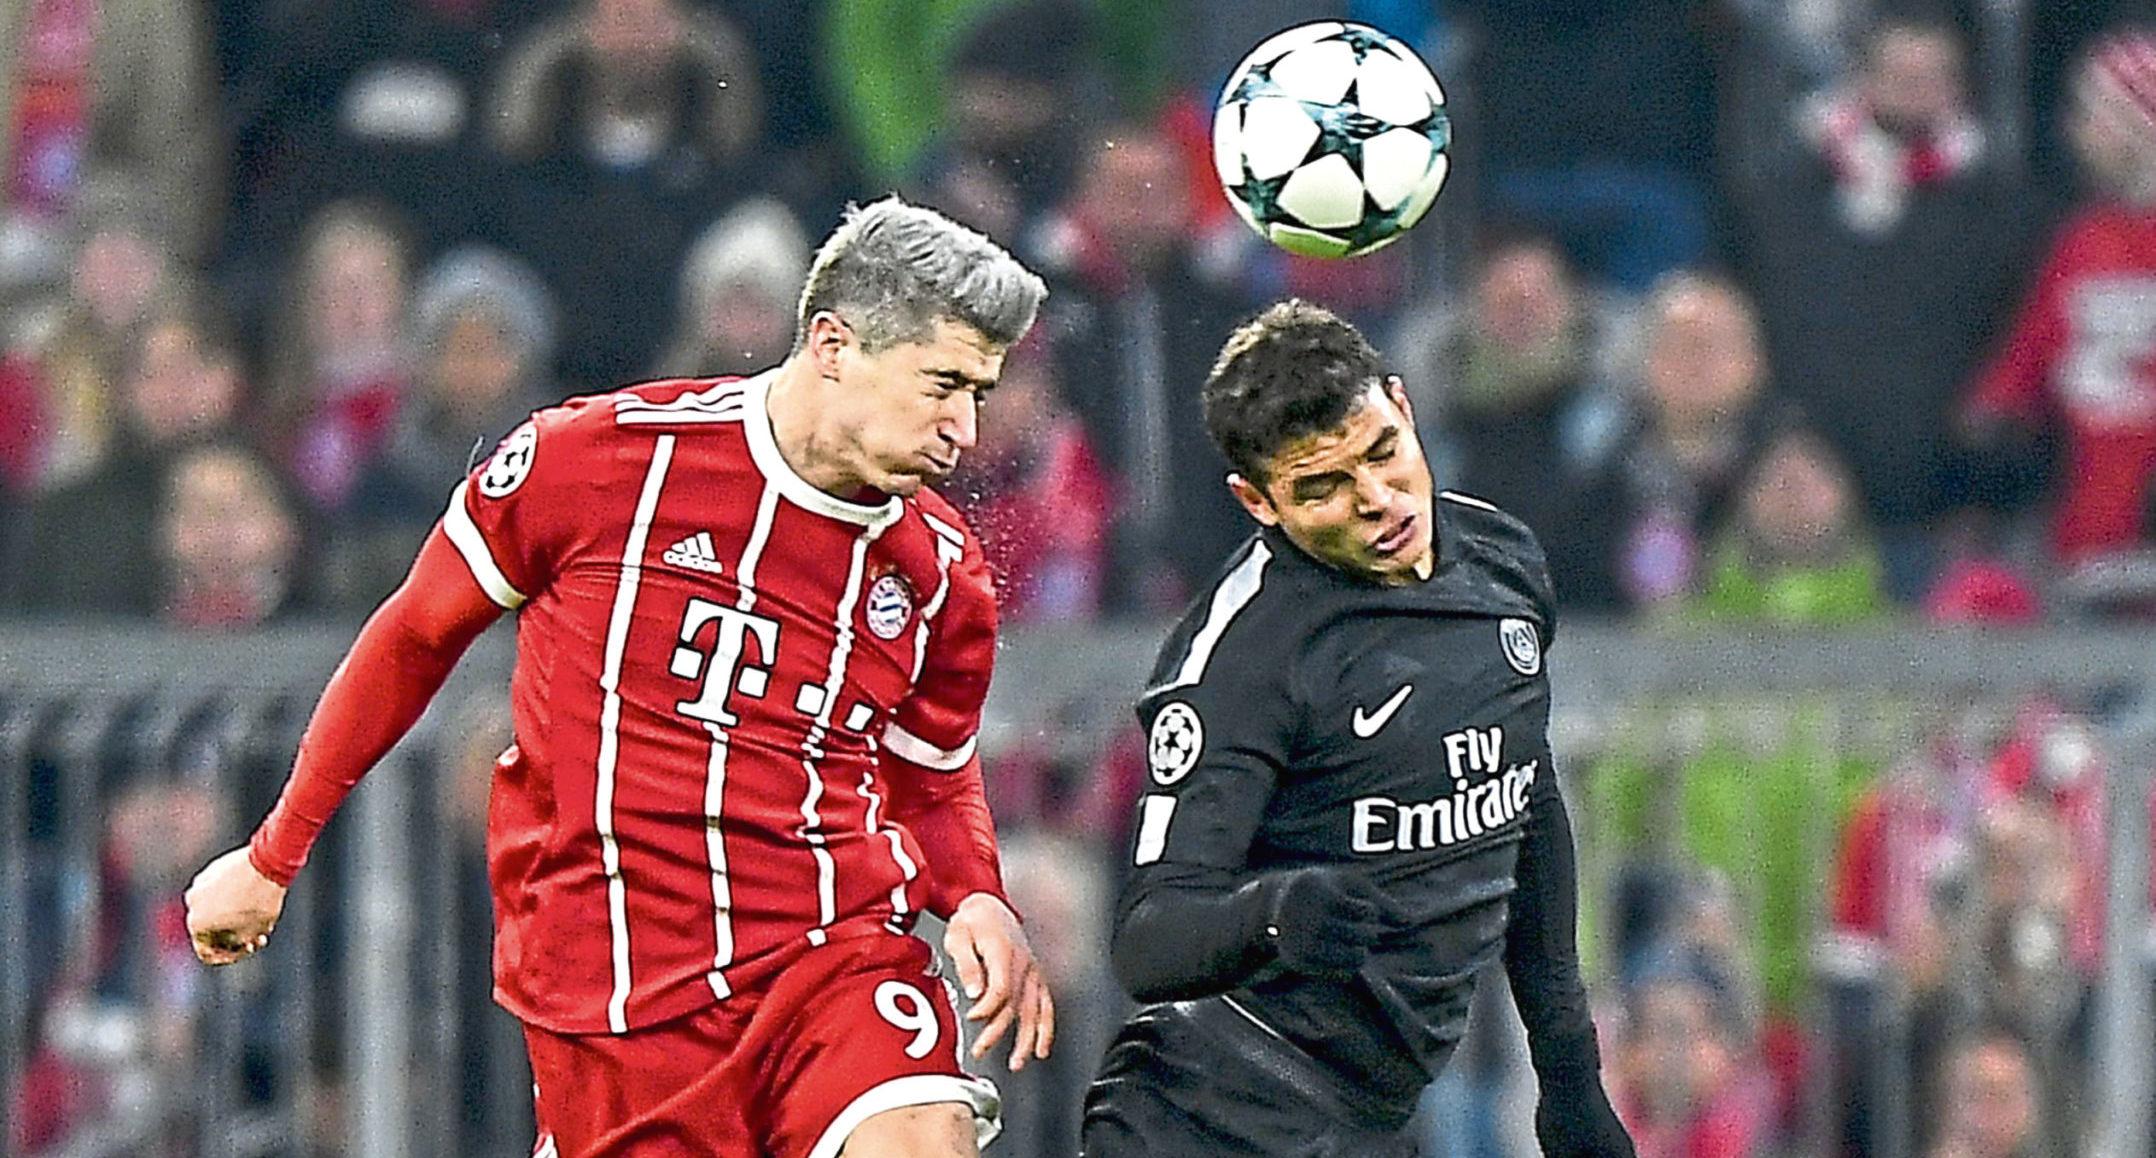 Robert Lewandowski and Thiago Silva clashed in the Champions League three years ago